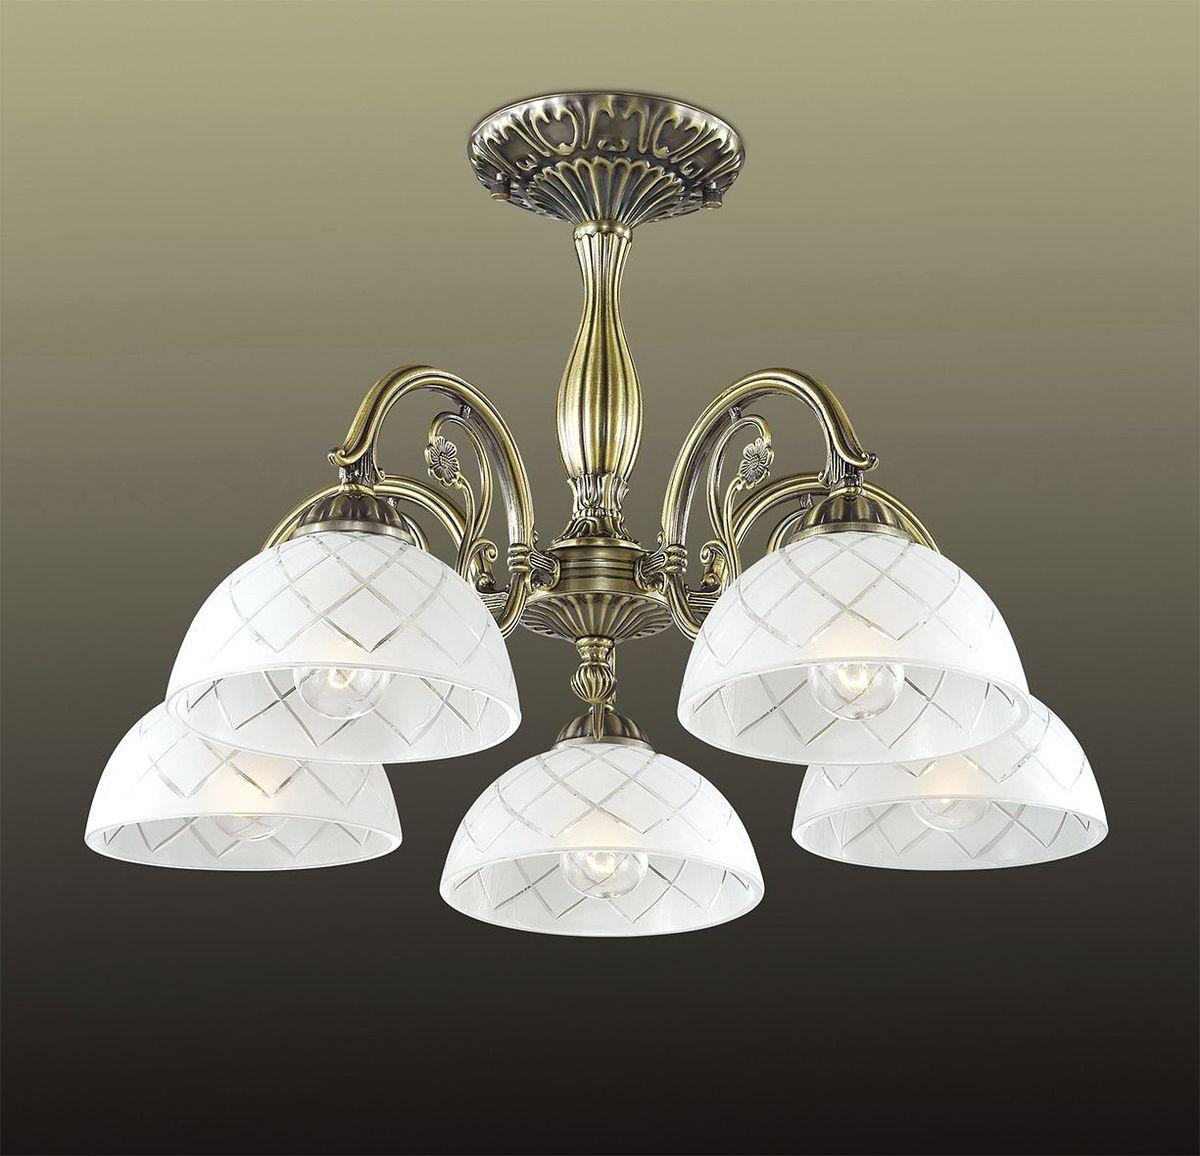 Люстра потолочная Odeon Light Emeril, 5 х E27, 60W. 2945/5C2945/5C